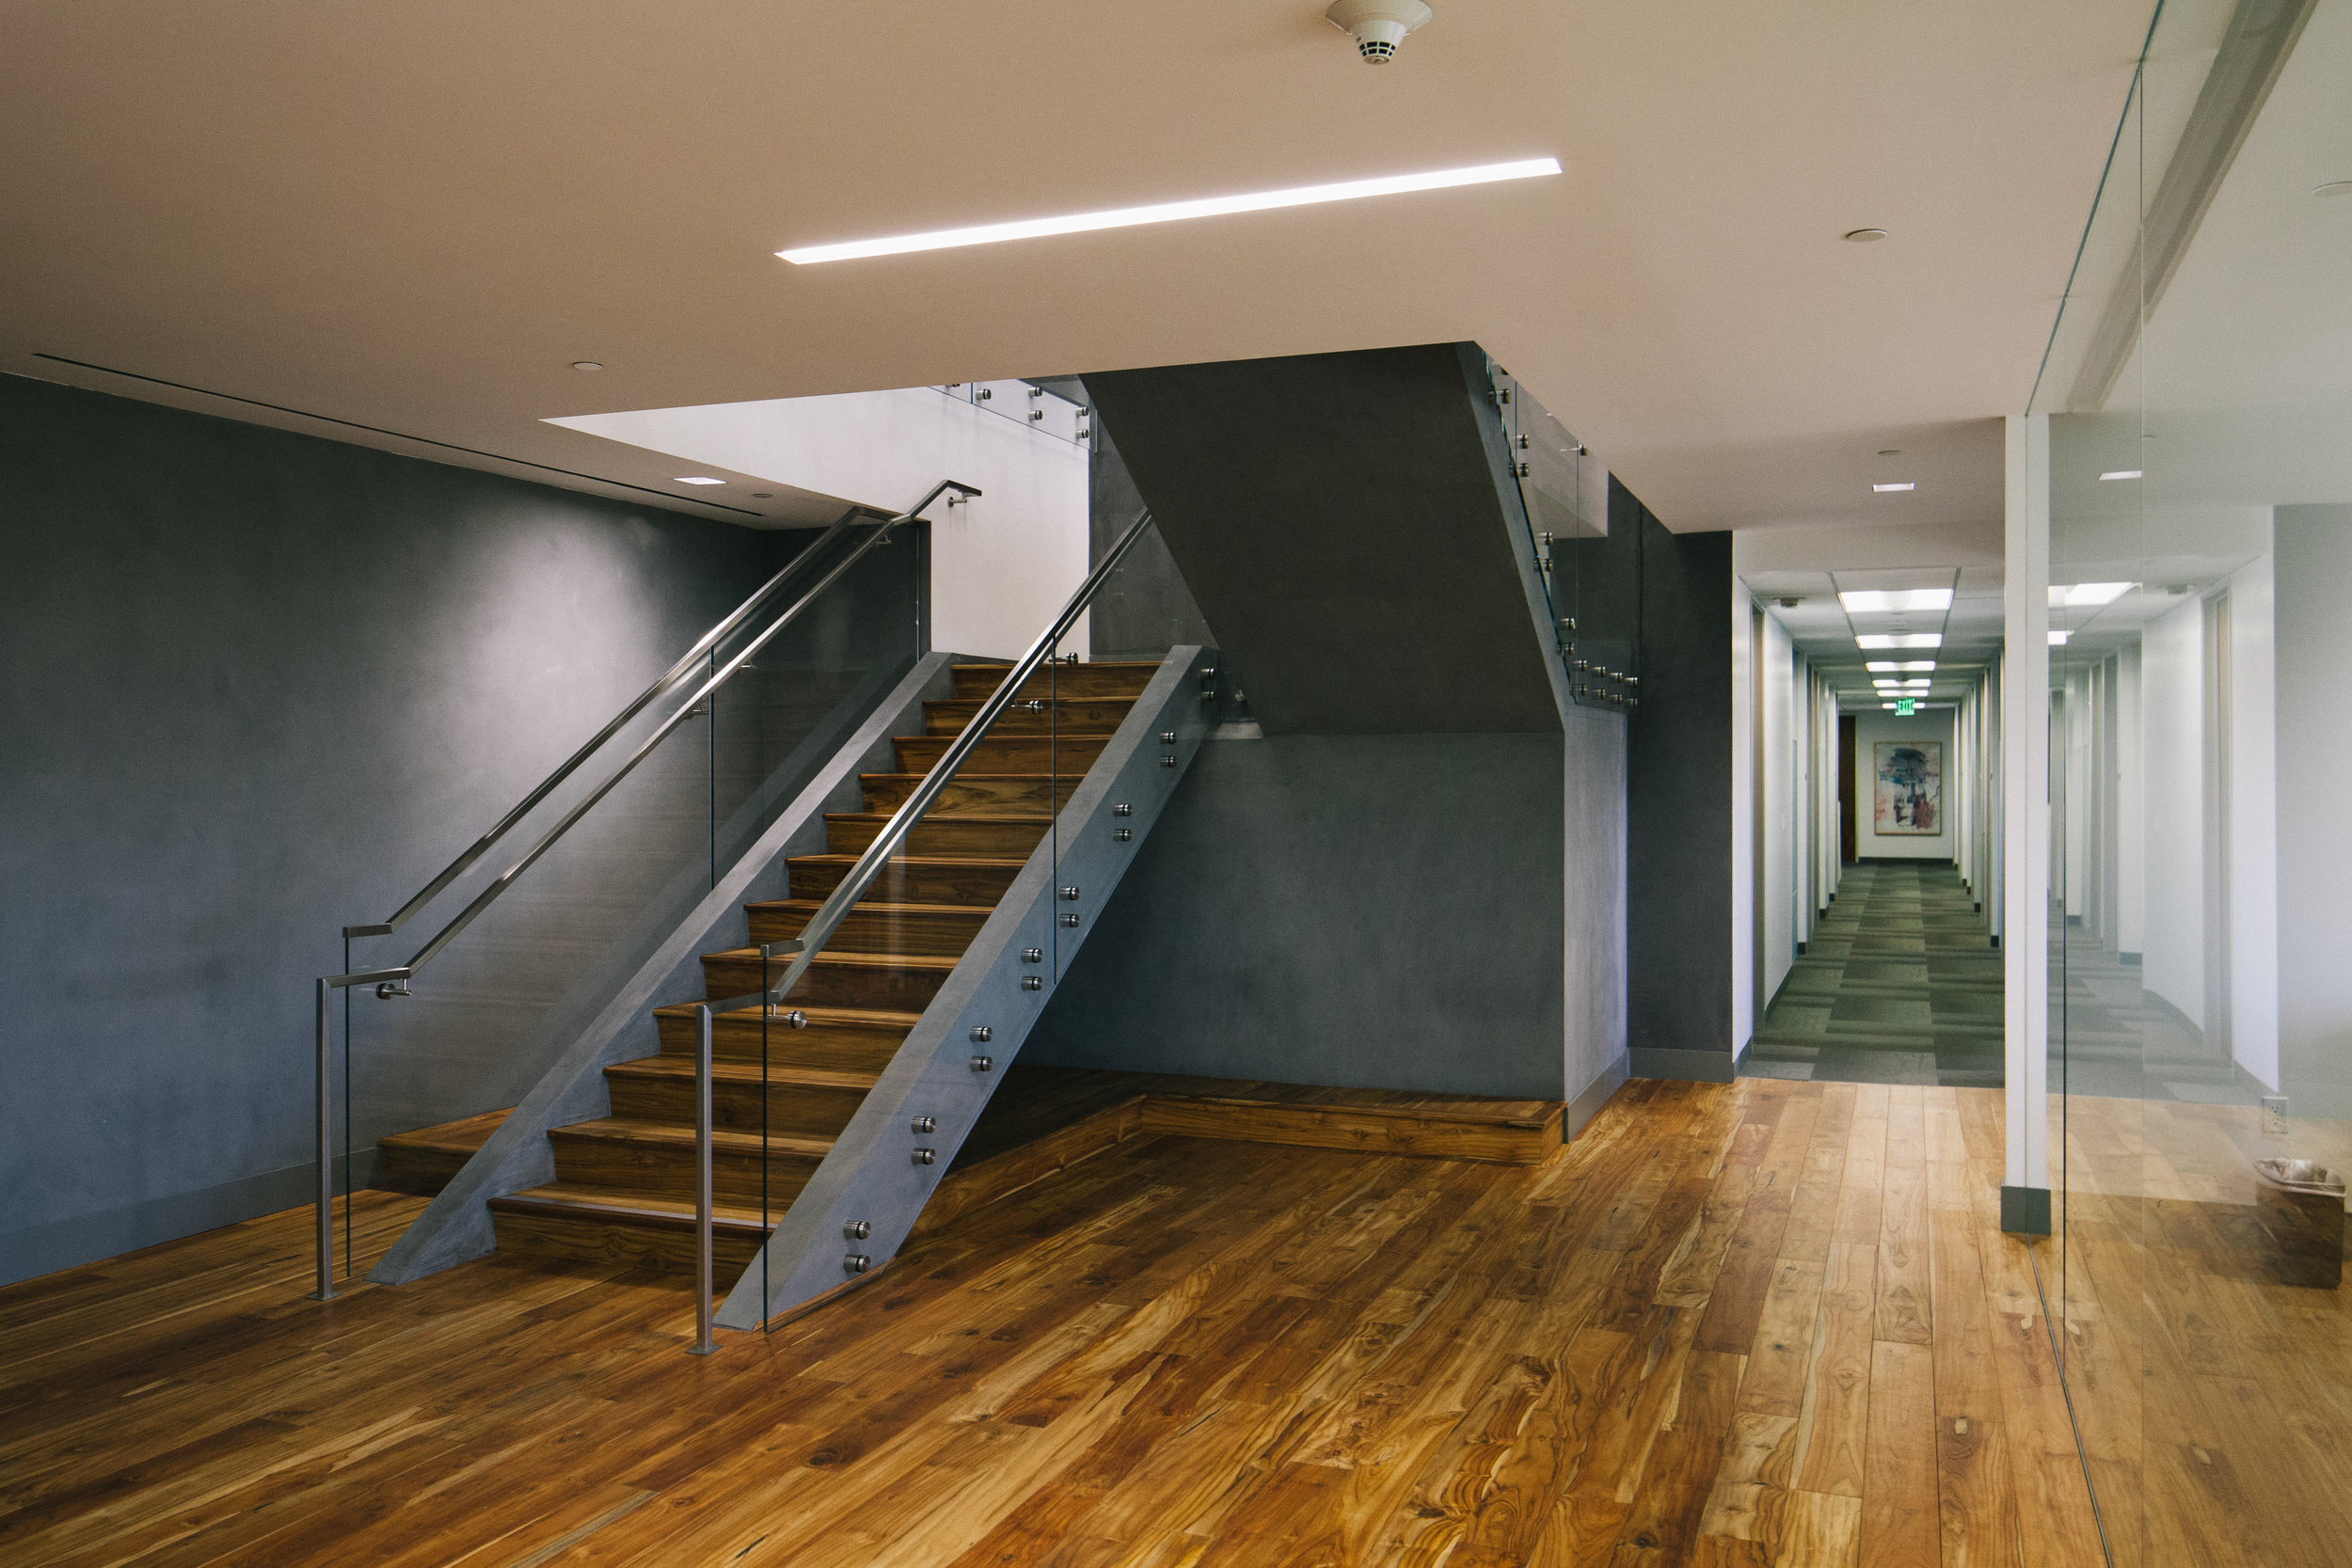 S.E.A.-Studio-Environmental-Architecture-David-Hertz-FAIA-First-Pacific-Advisors-Los-Angeles-tenant-improvement-sustainable-regenerative-restorative-green-design-office-sleek-modern-interior-Westside-commercial-building-professional-workplace-5.jpg